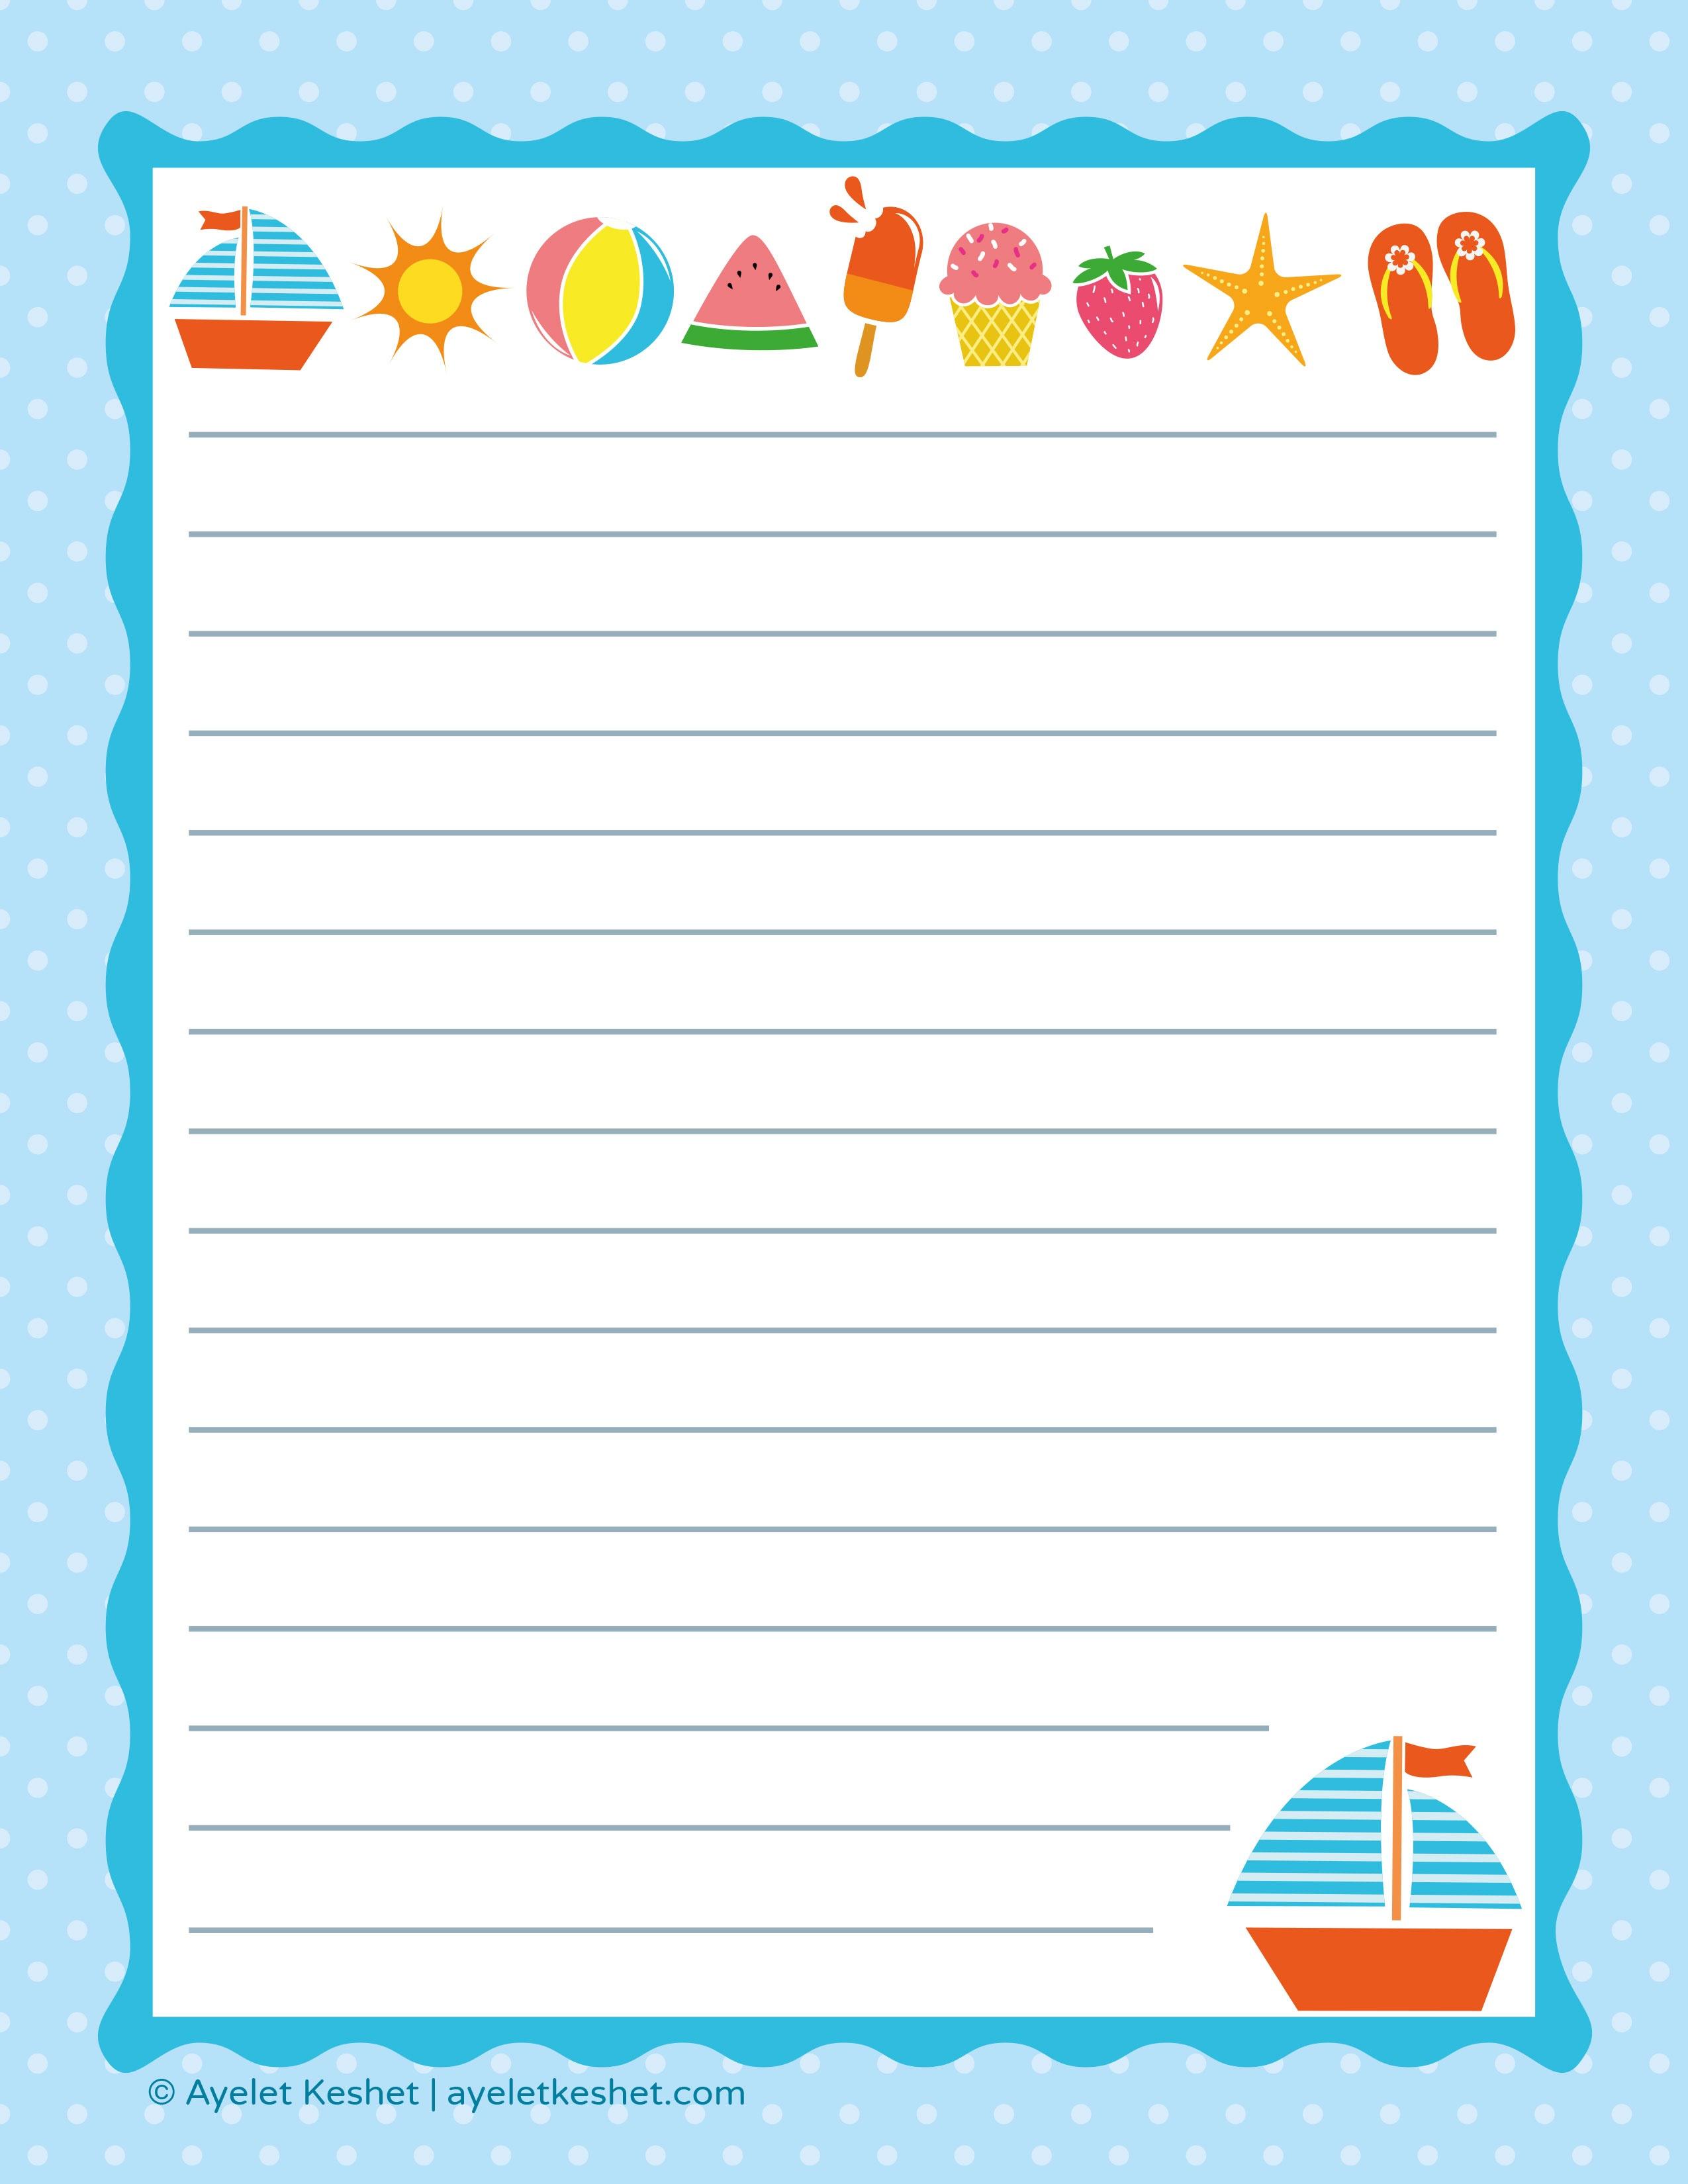 Free Printable Letter Paper - Ayelet Keshet - Free Printable Stationery